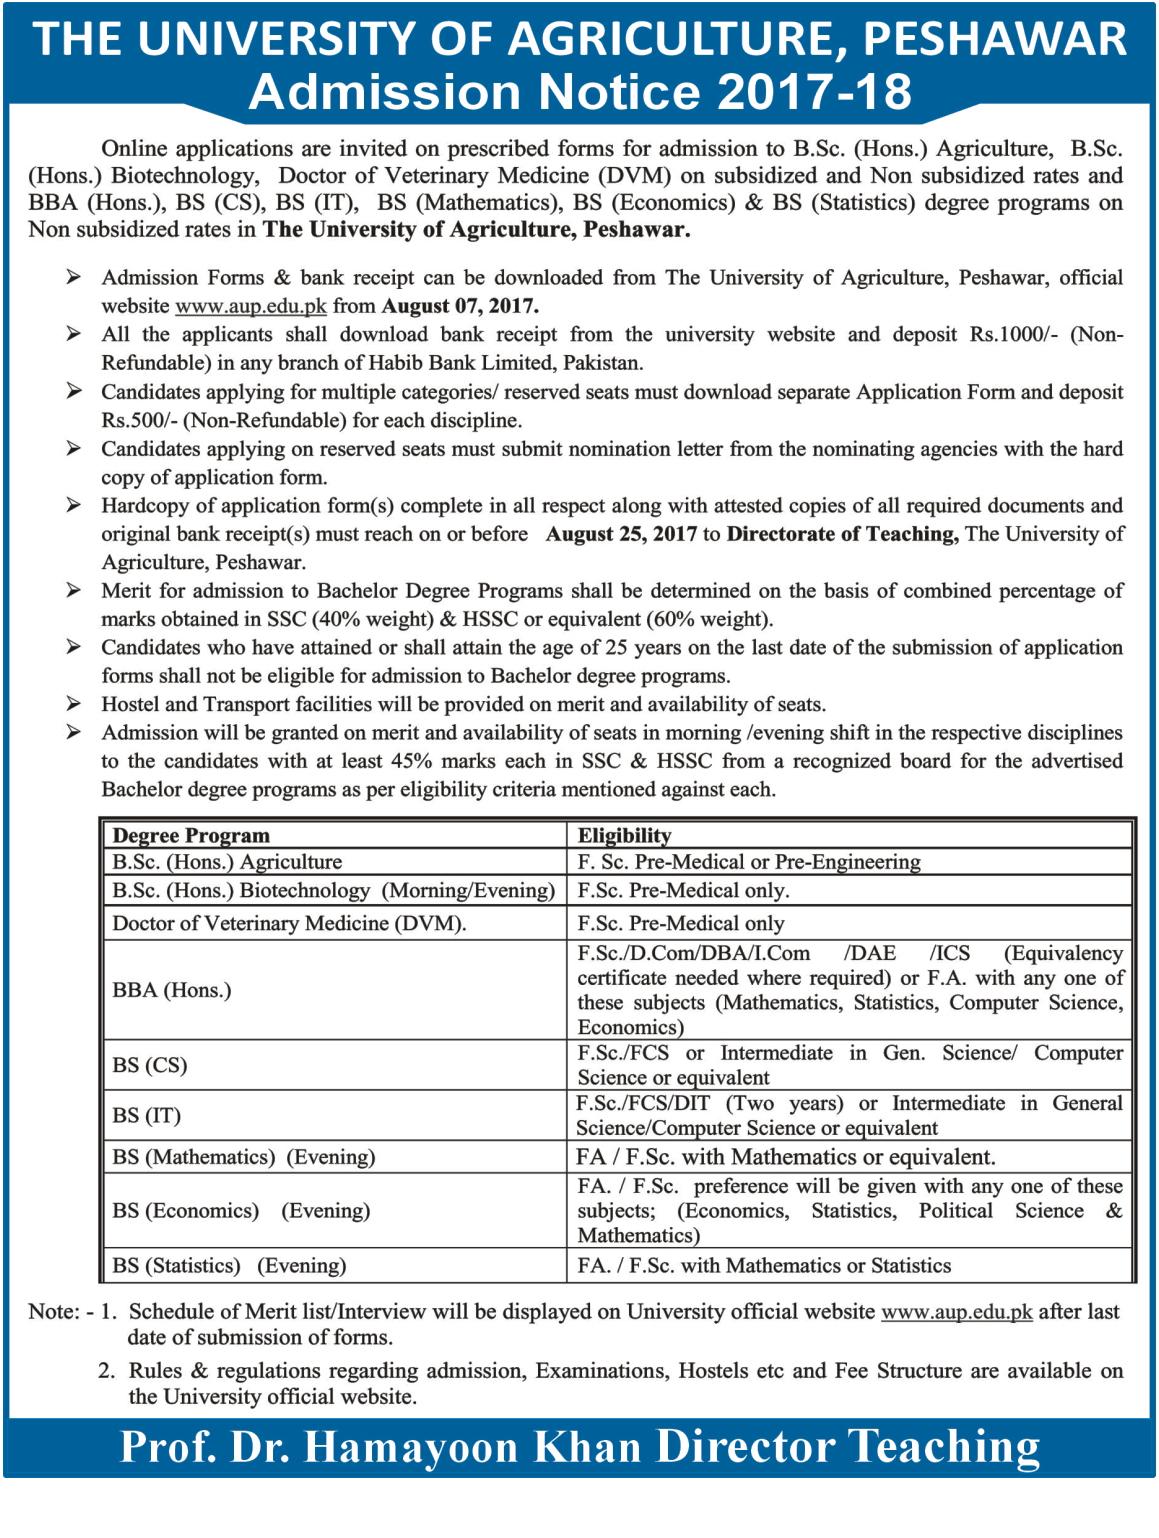 Agriculture University Peshawar Admission 2017 Form, Last Date